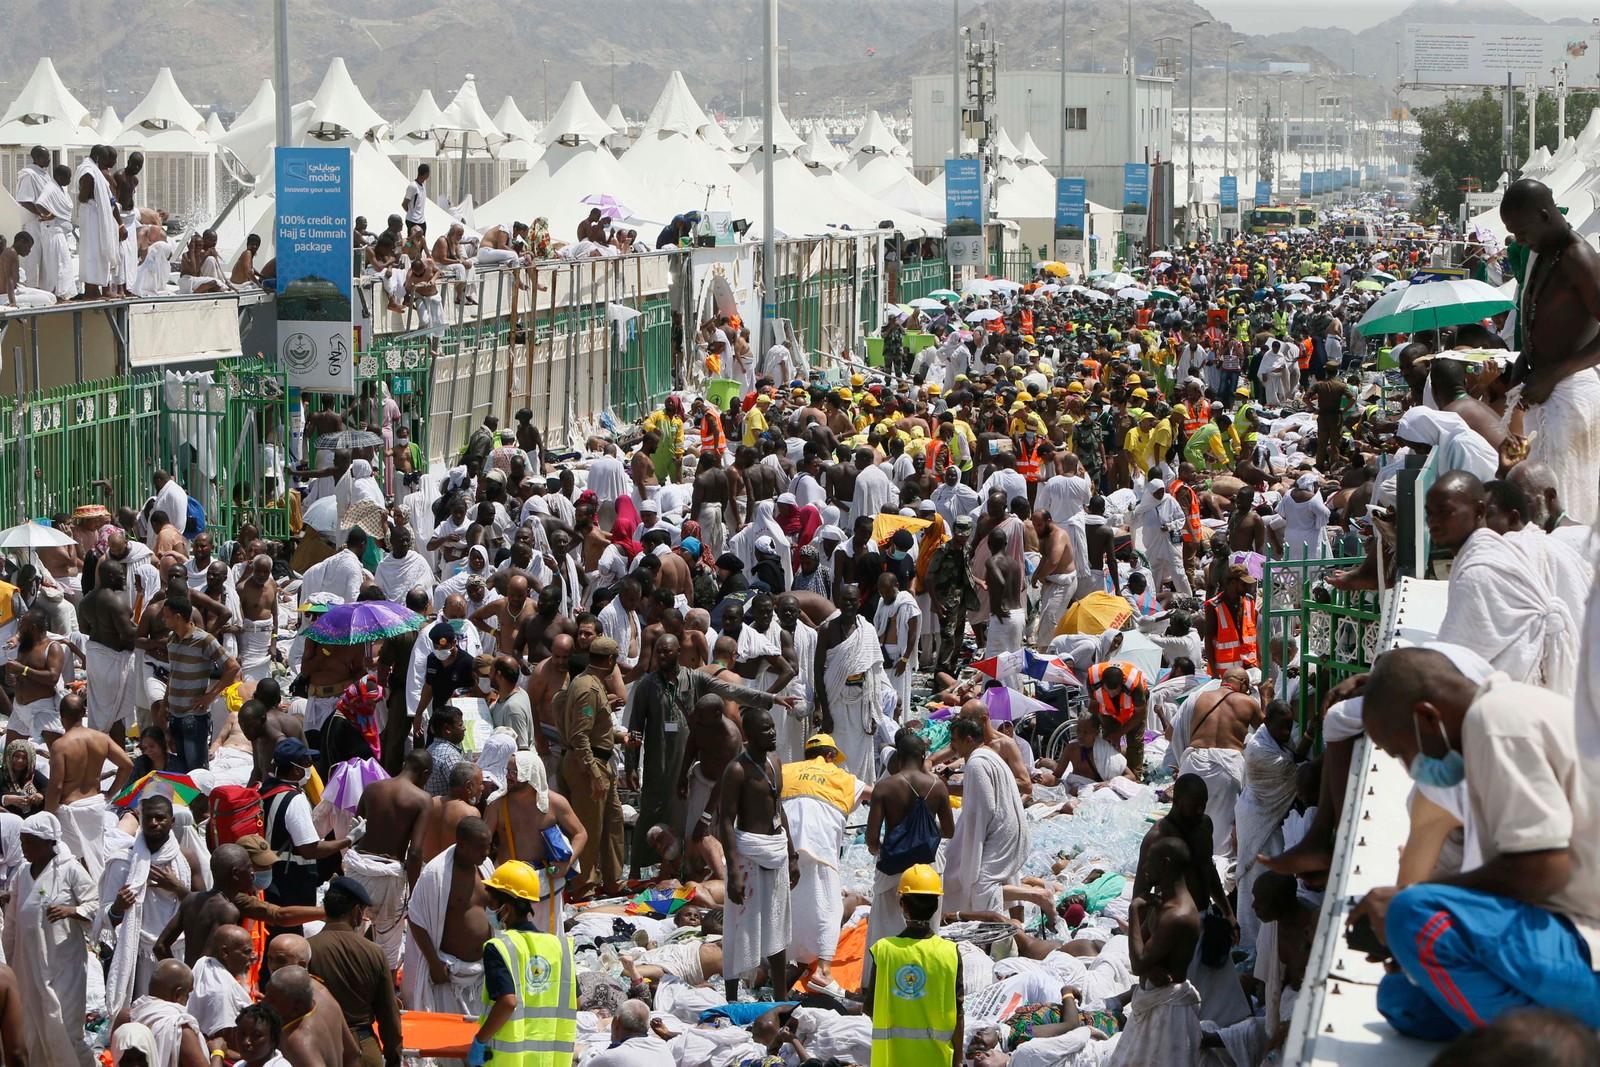 Pilegrimer og redningspersonell på stedet der over 700 mennesker ble trampet i hjel.